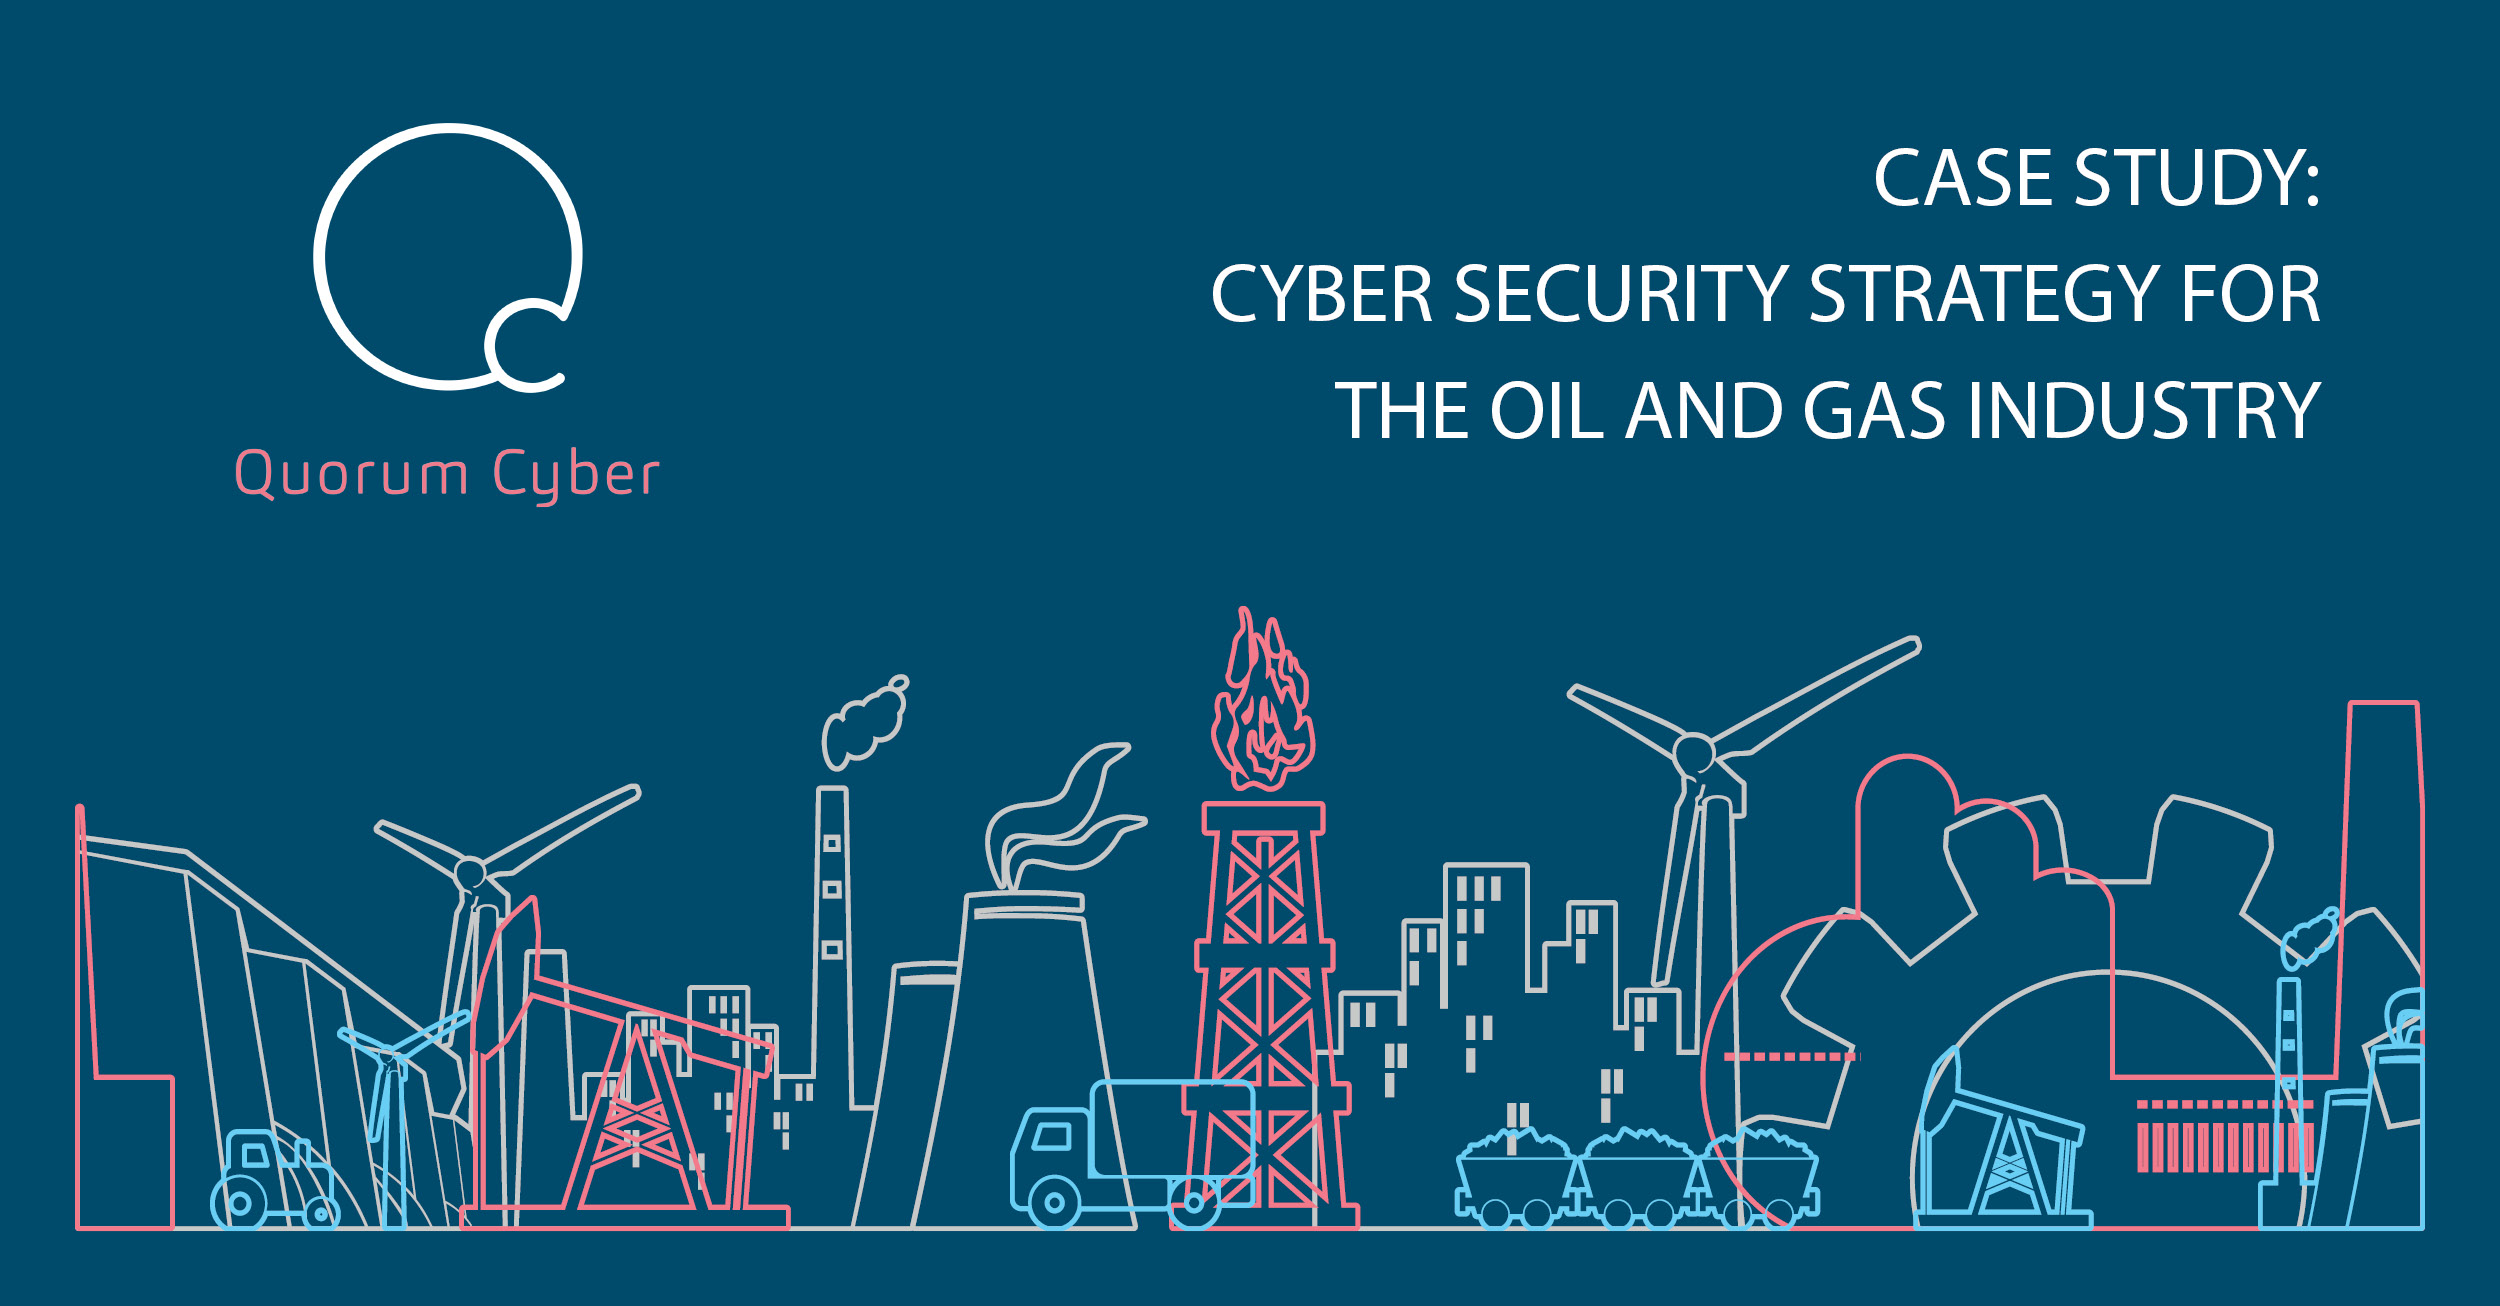 qc-oil-gas-industry-case-study.jpg